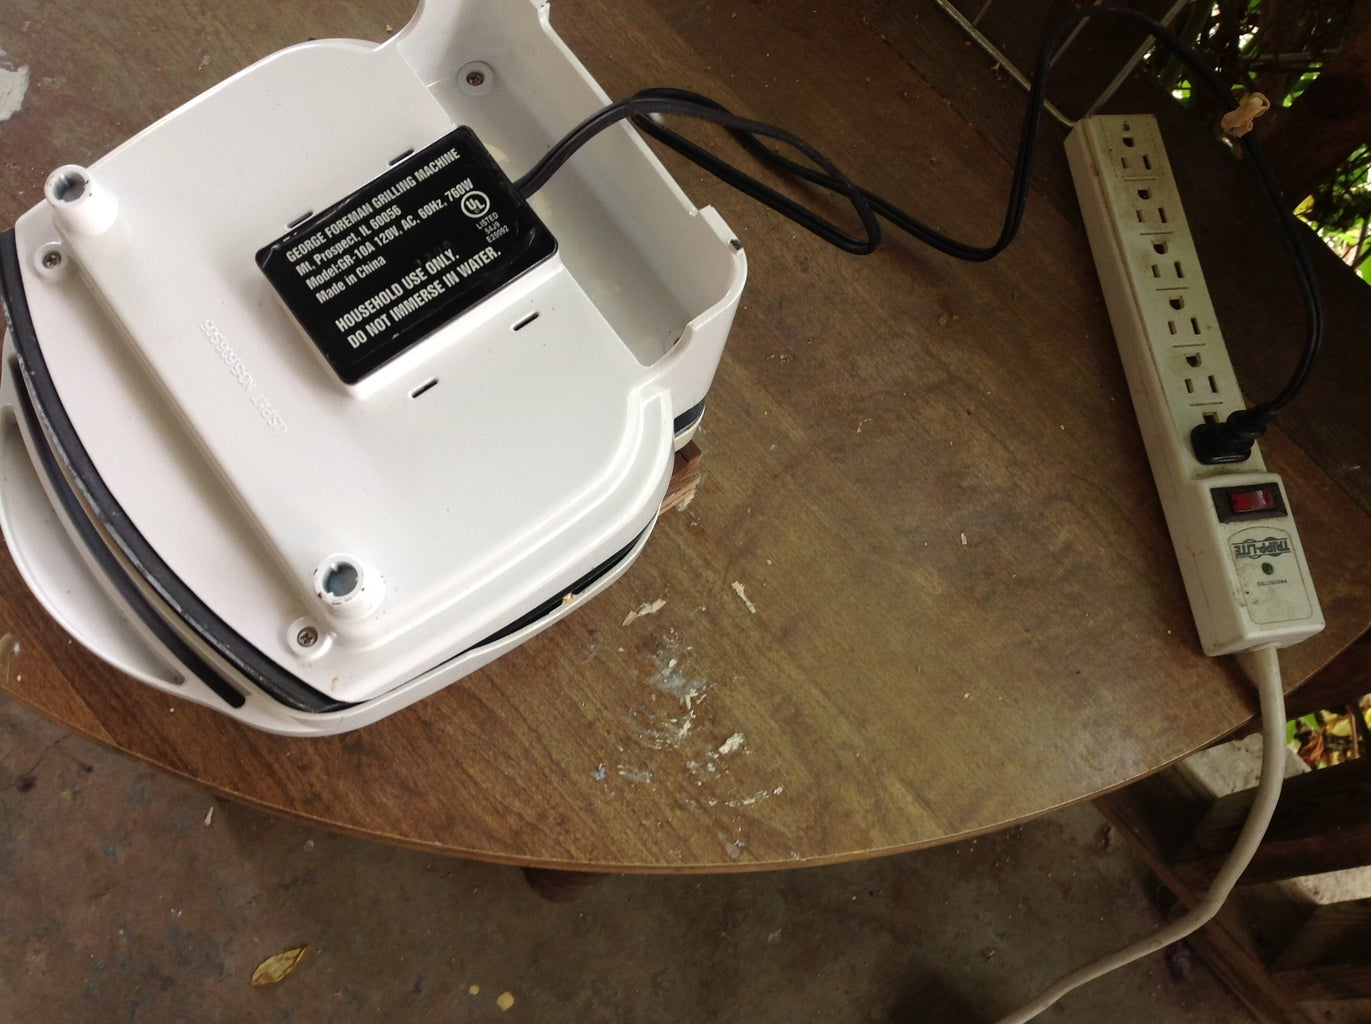 Setting the Iron Up to Melt Plastic.